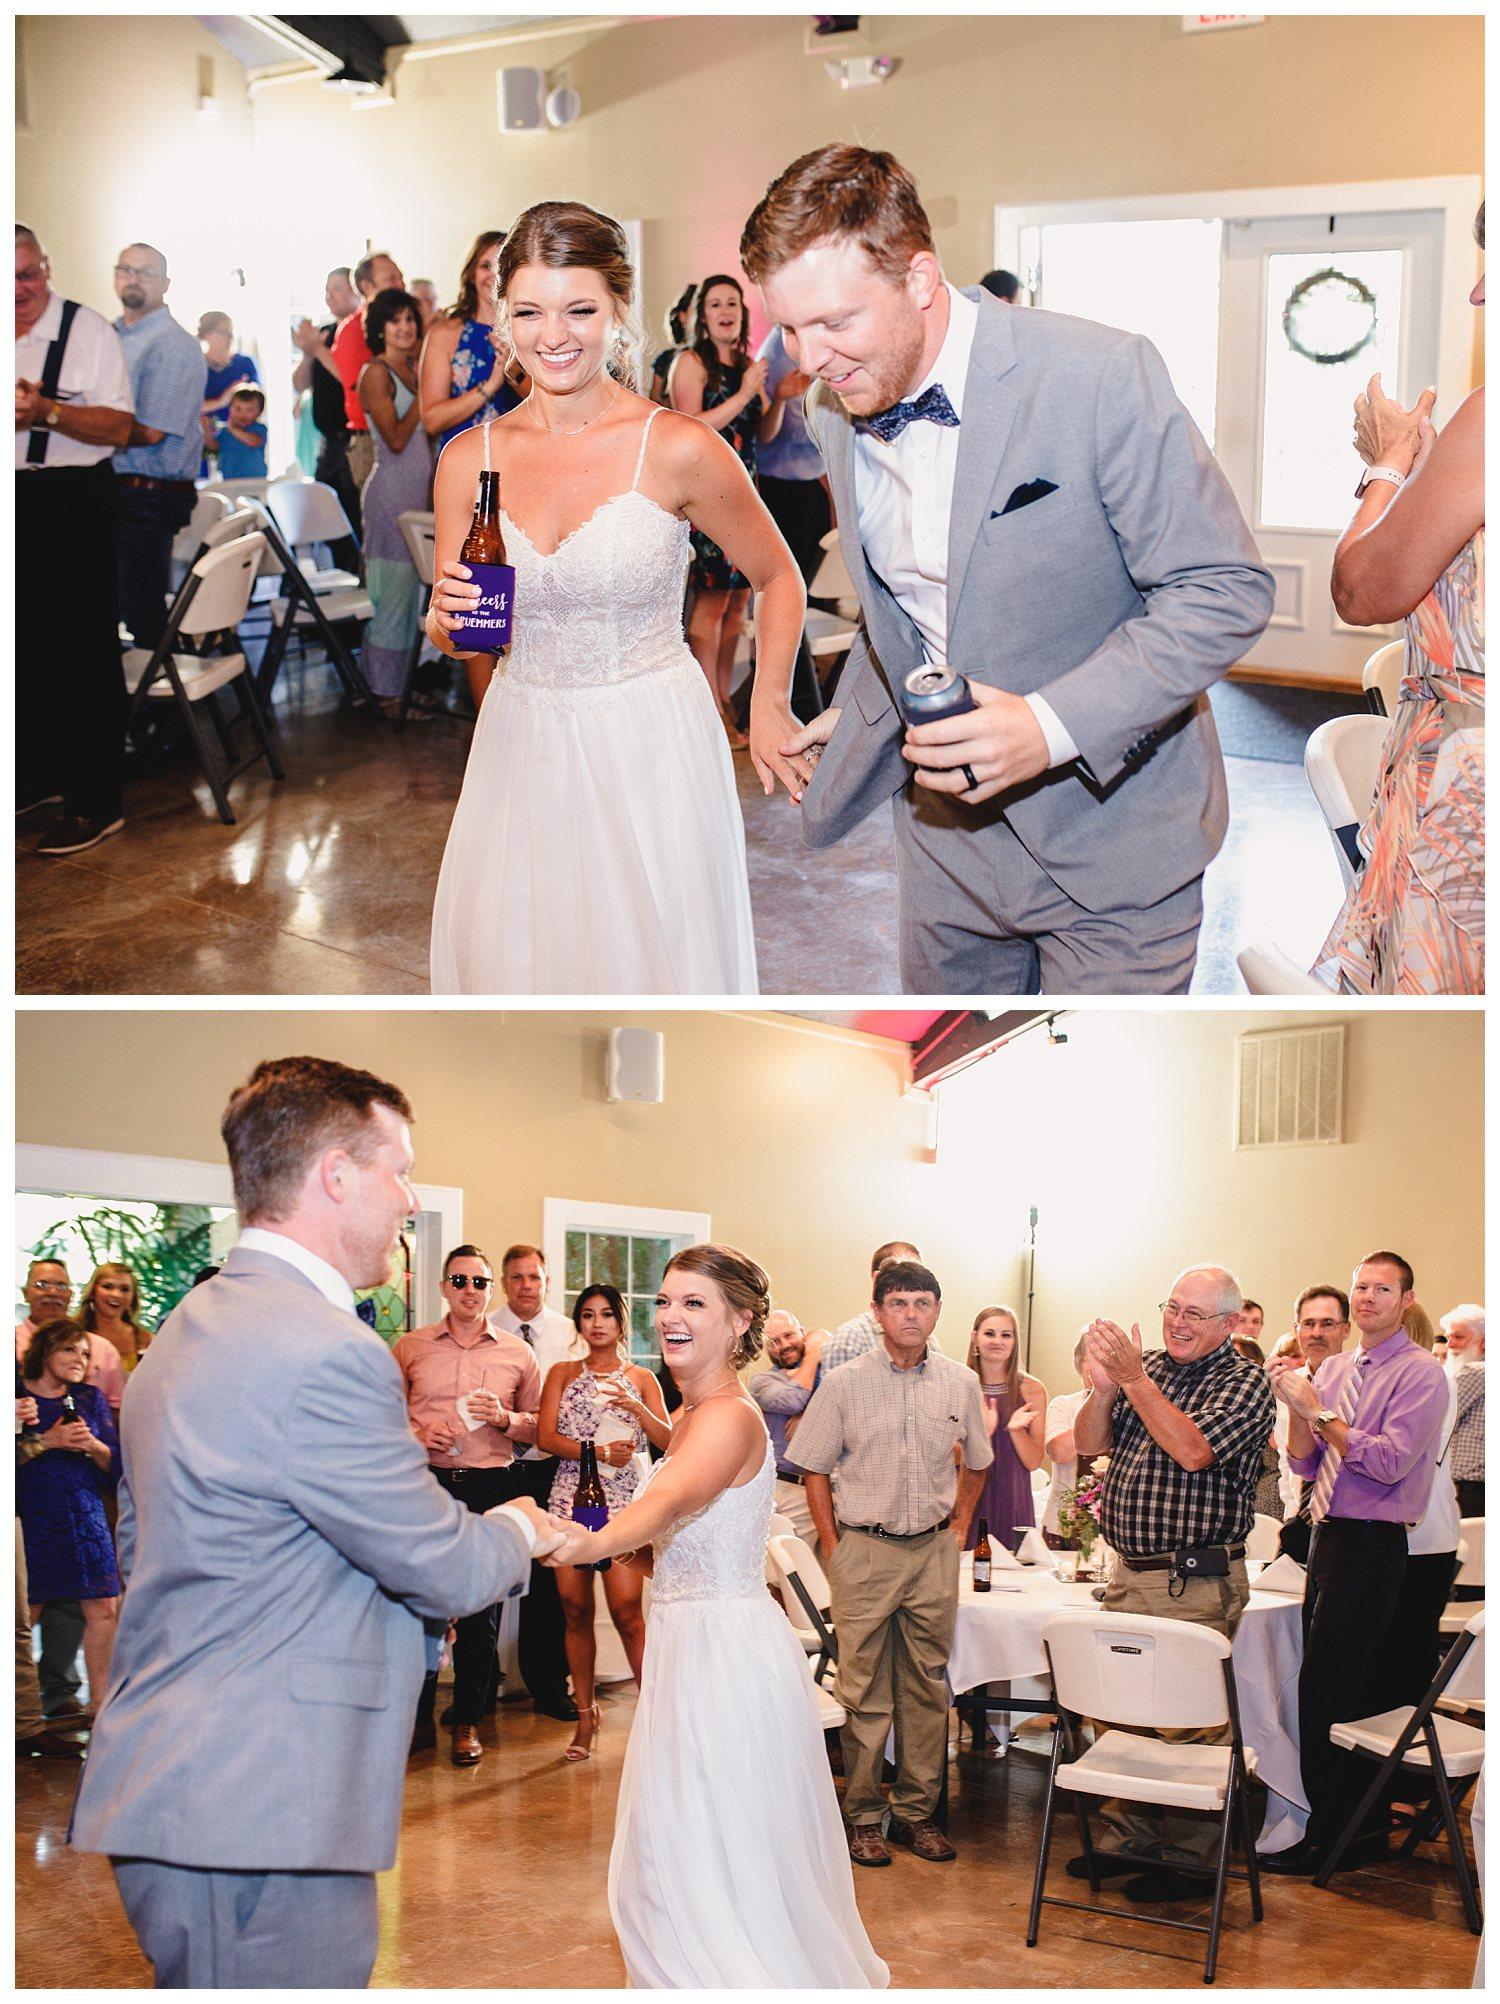 Kelsey_Diane_Photography_Kansas_City_Engagement_Wedding_Photographer_Midwest_Traveling_Missouri_Lee_Andrew_Hall_And_Garden_Blue_Springs_Wedding_Clayton_Kimberly_Summer_Wedding_0843.jpg